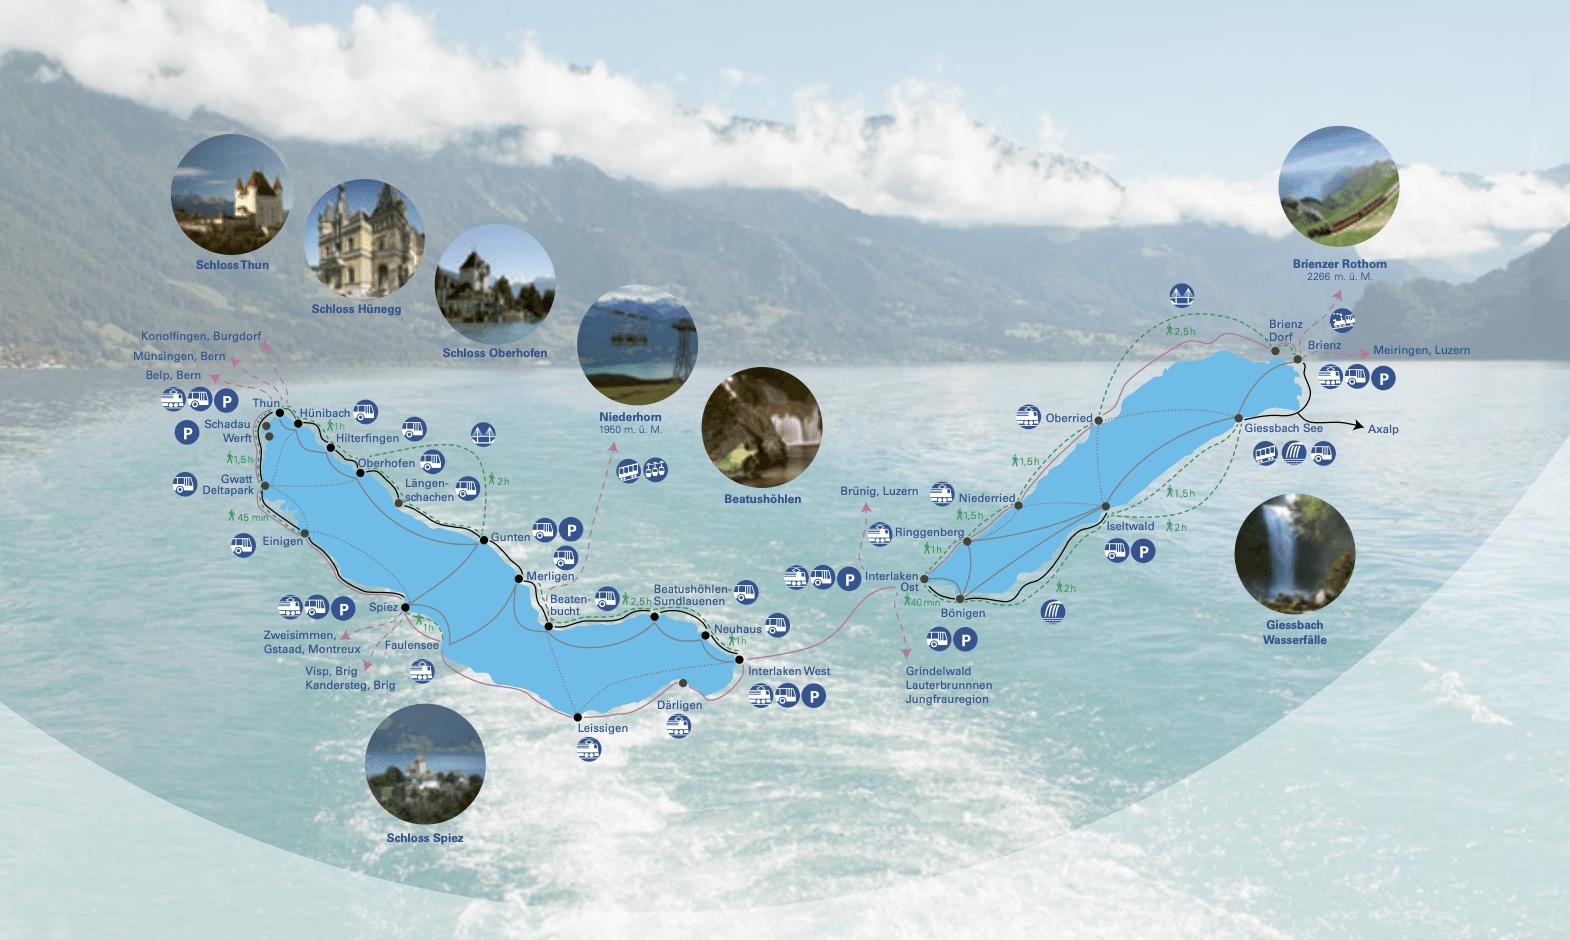 passeios de barco em interlaken